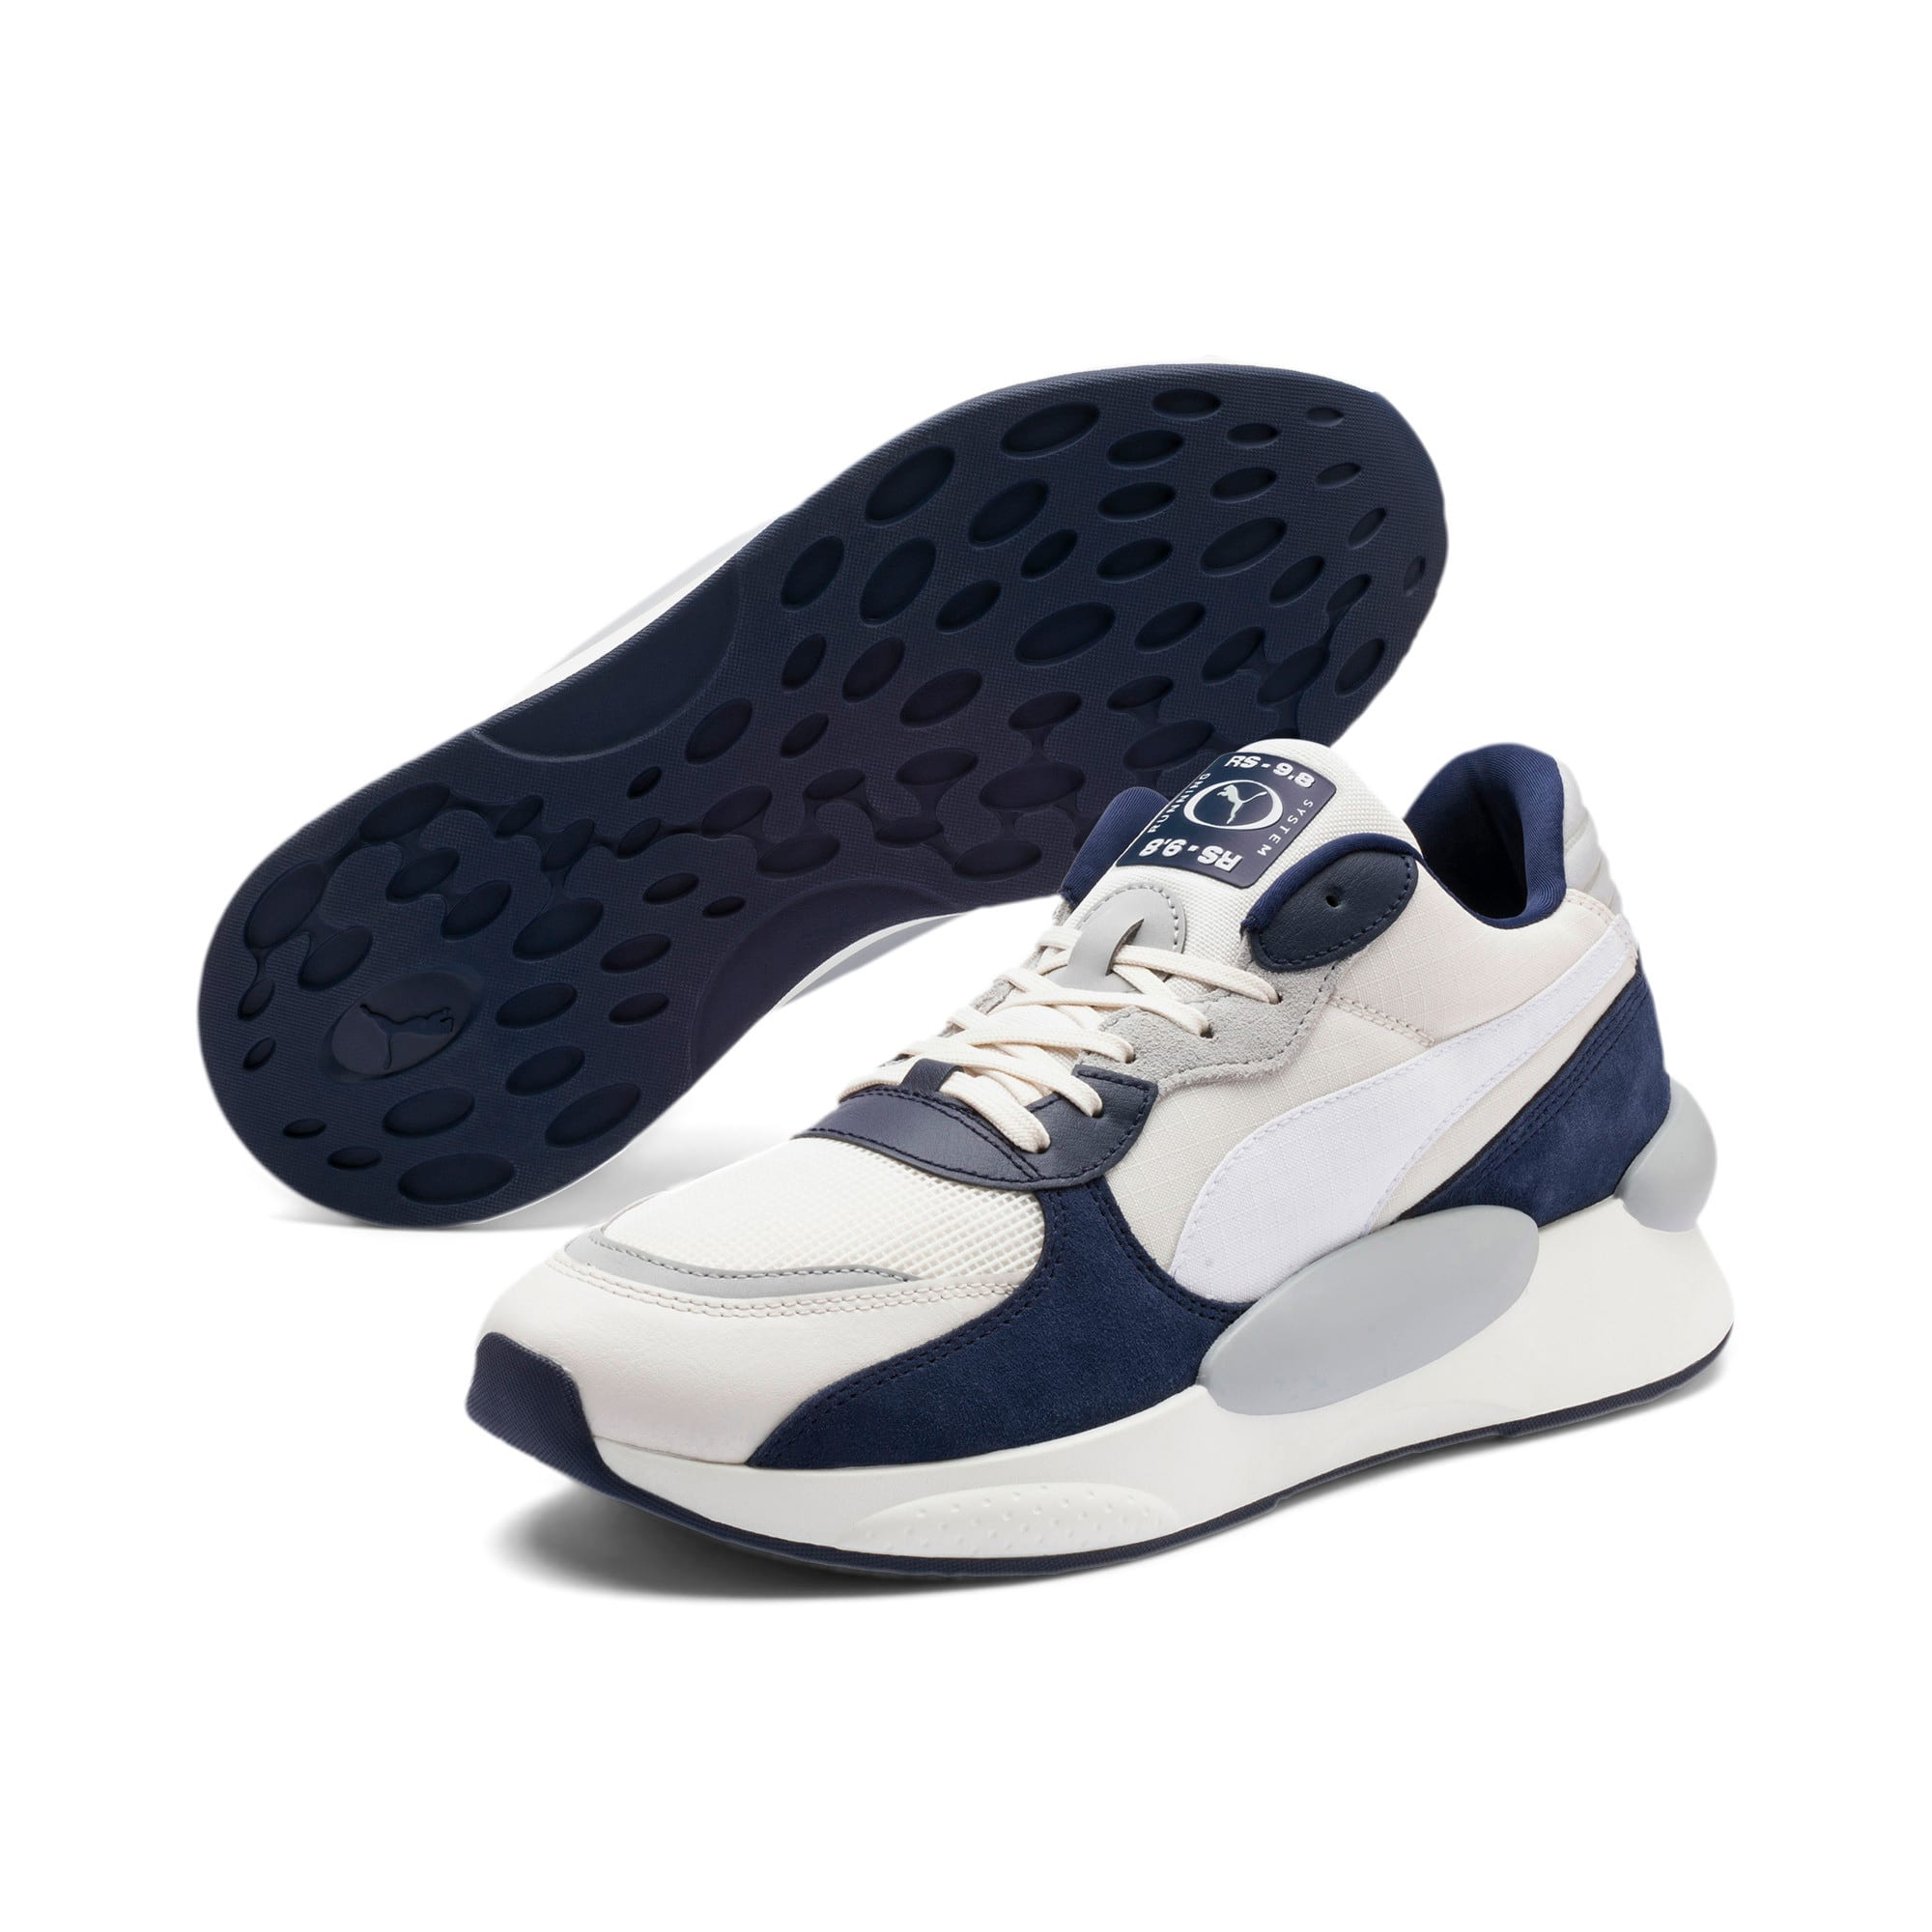 Thumbnail 2 of RS 9.8 Space Sneakers, Whisper White-Peacoat, medium